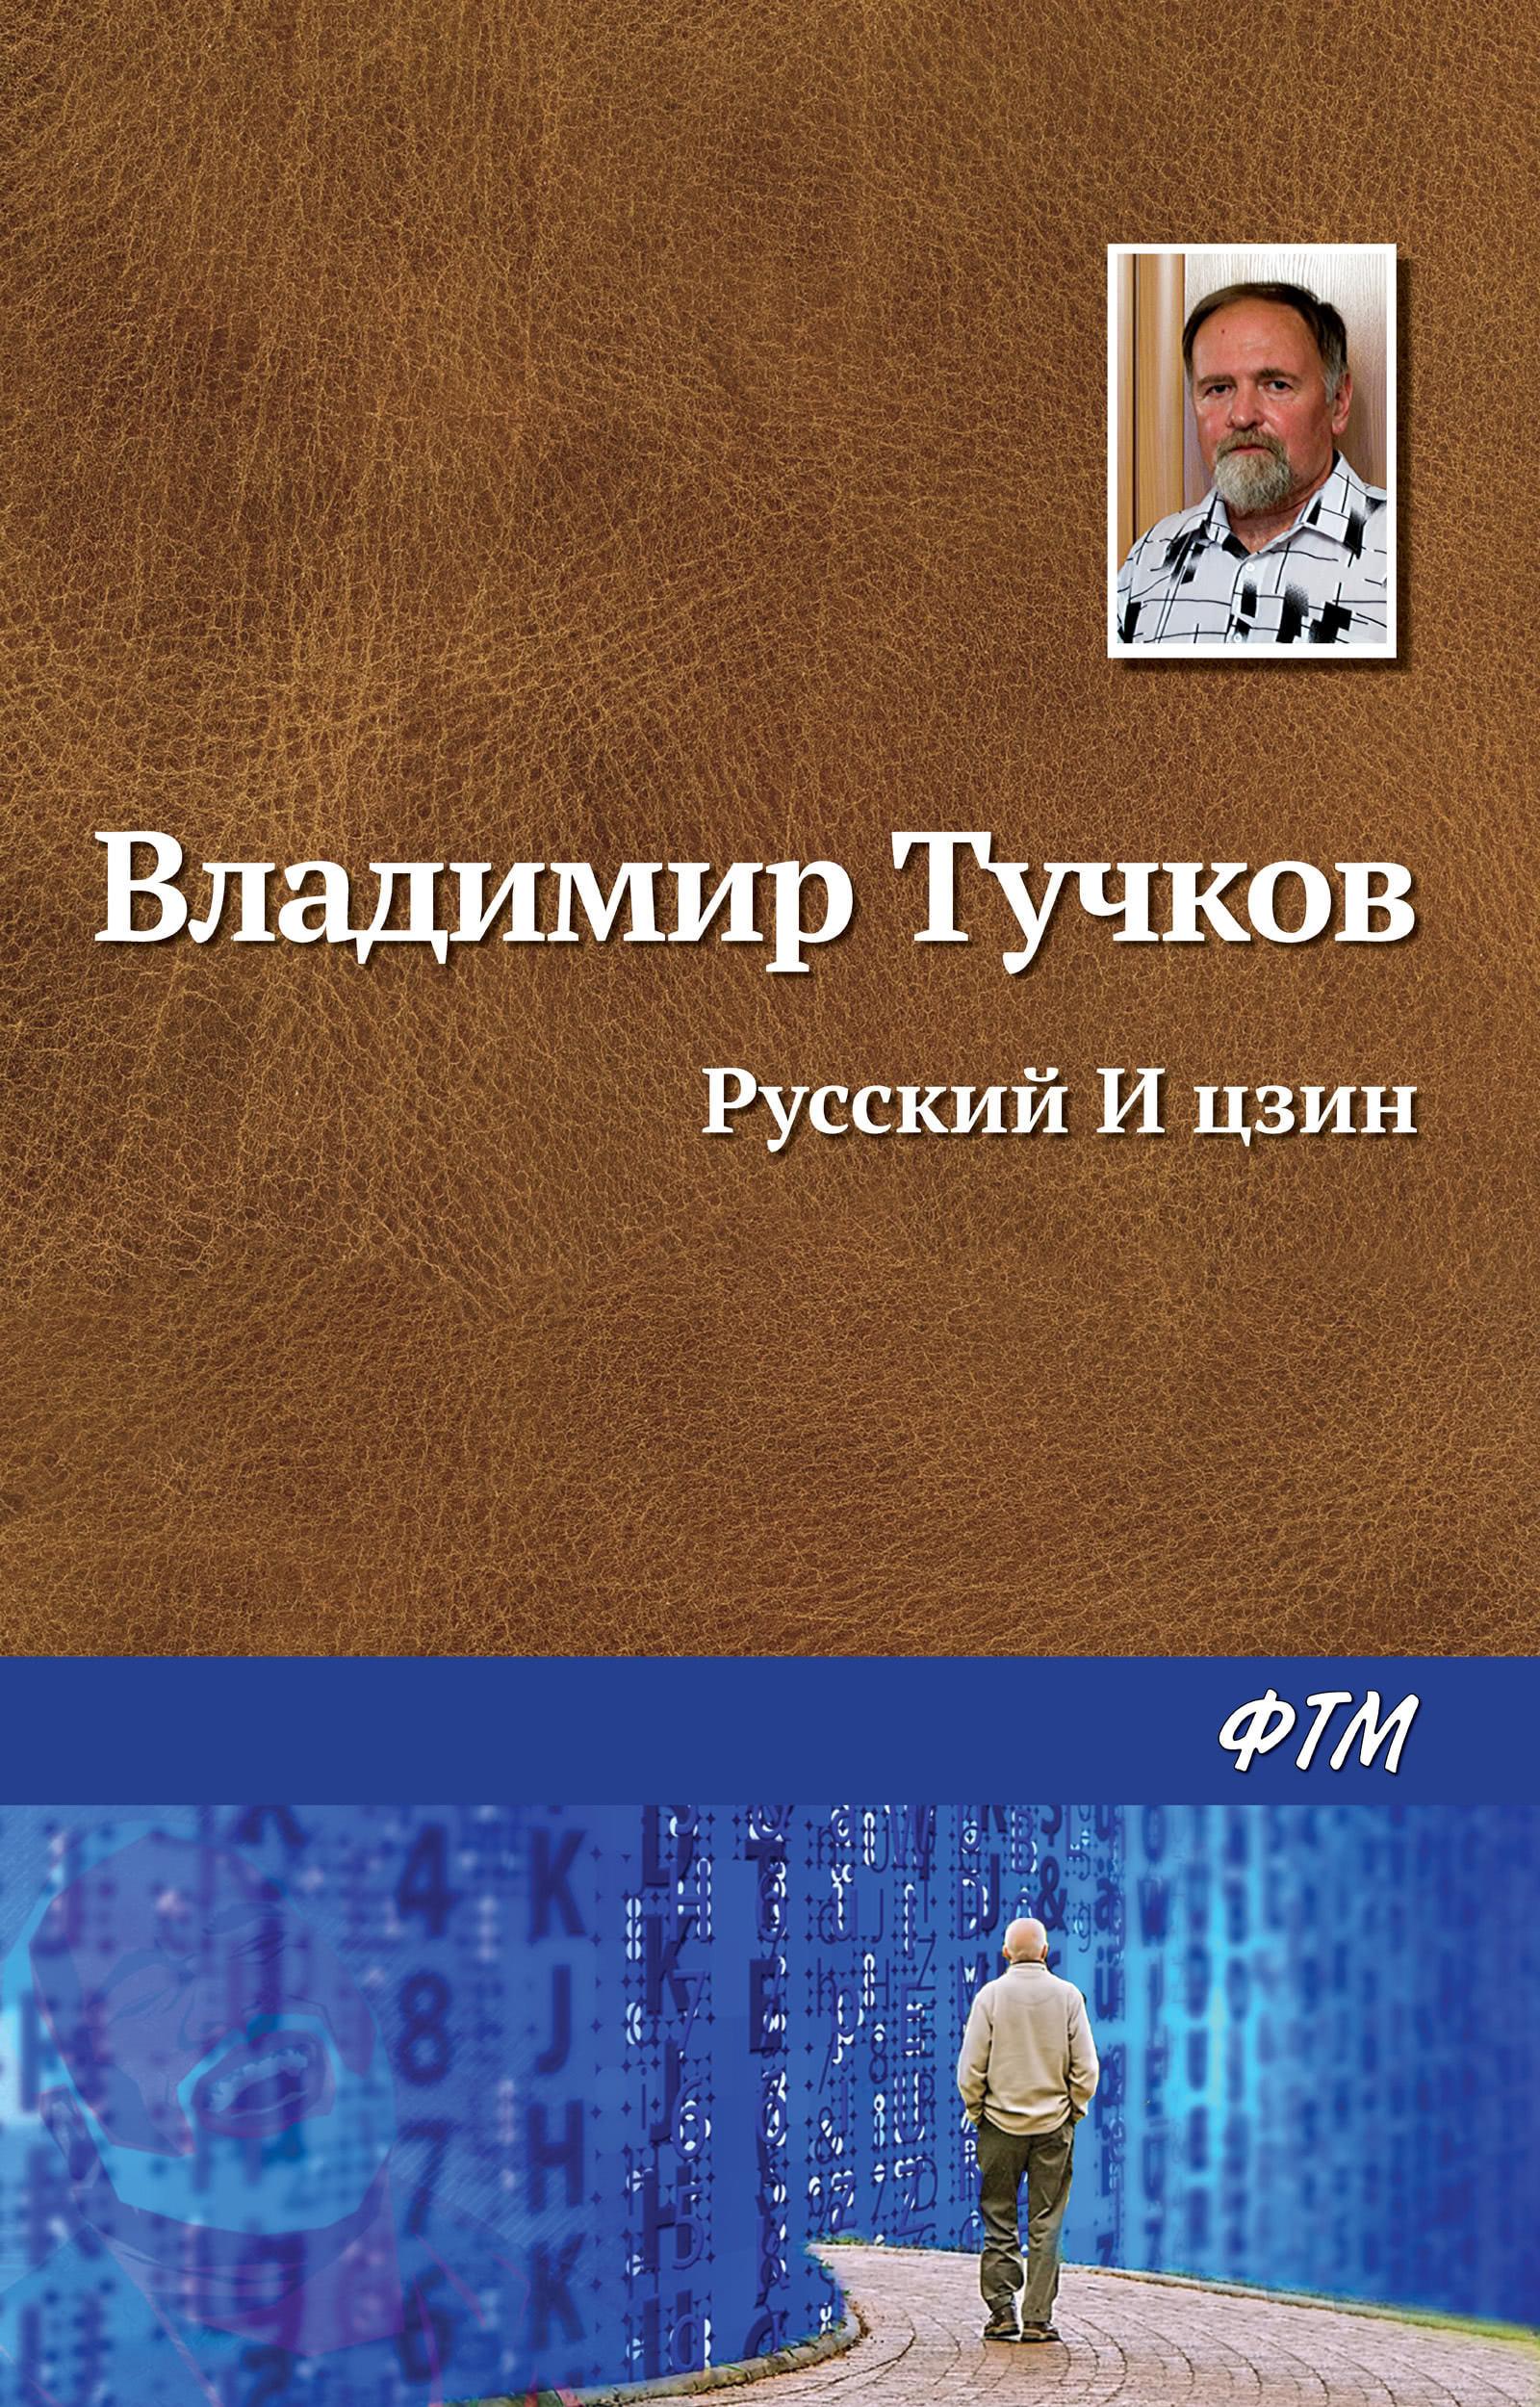 russkiy i tszin